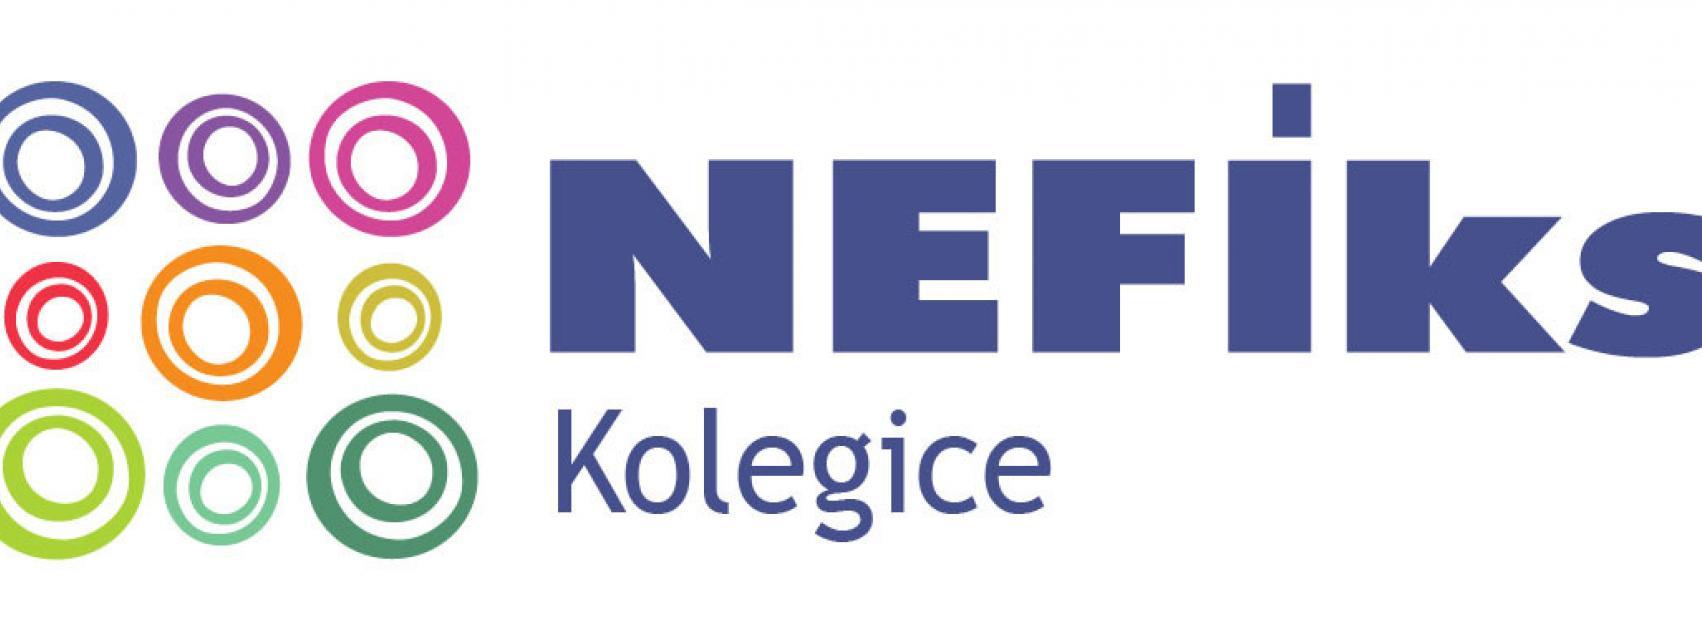 kolegice_logo.jpg